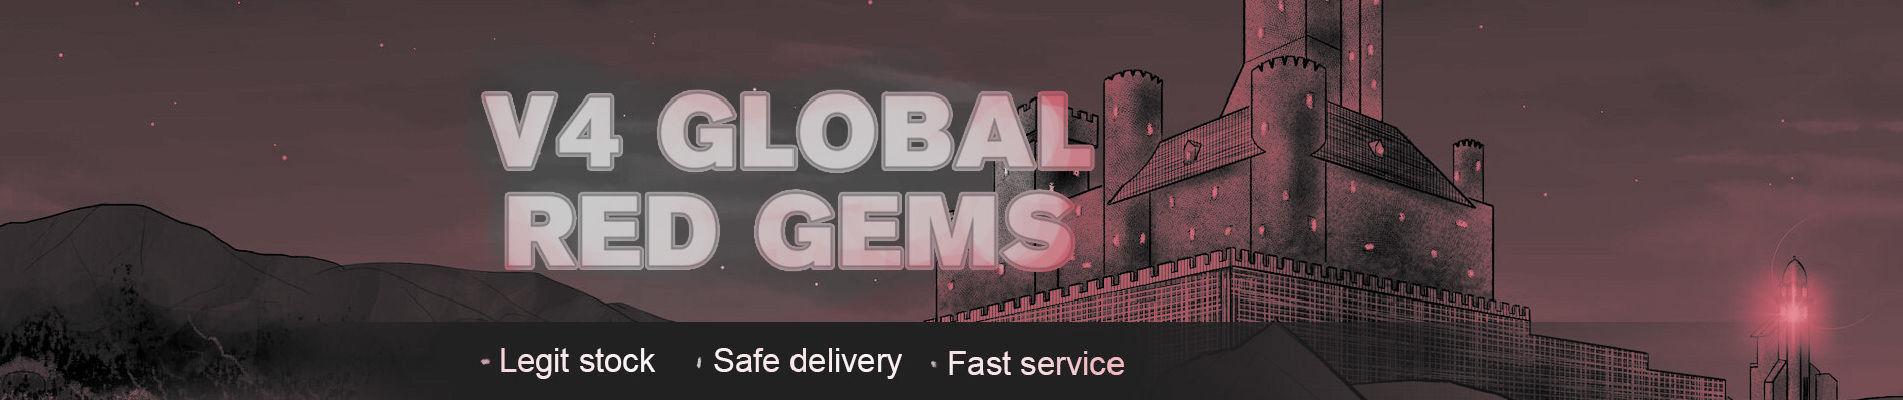 V4 Global Red Gems